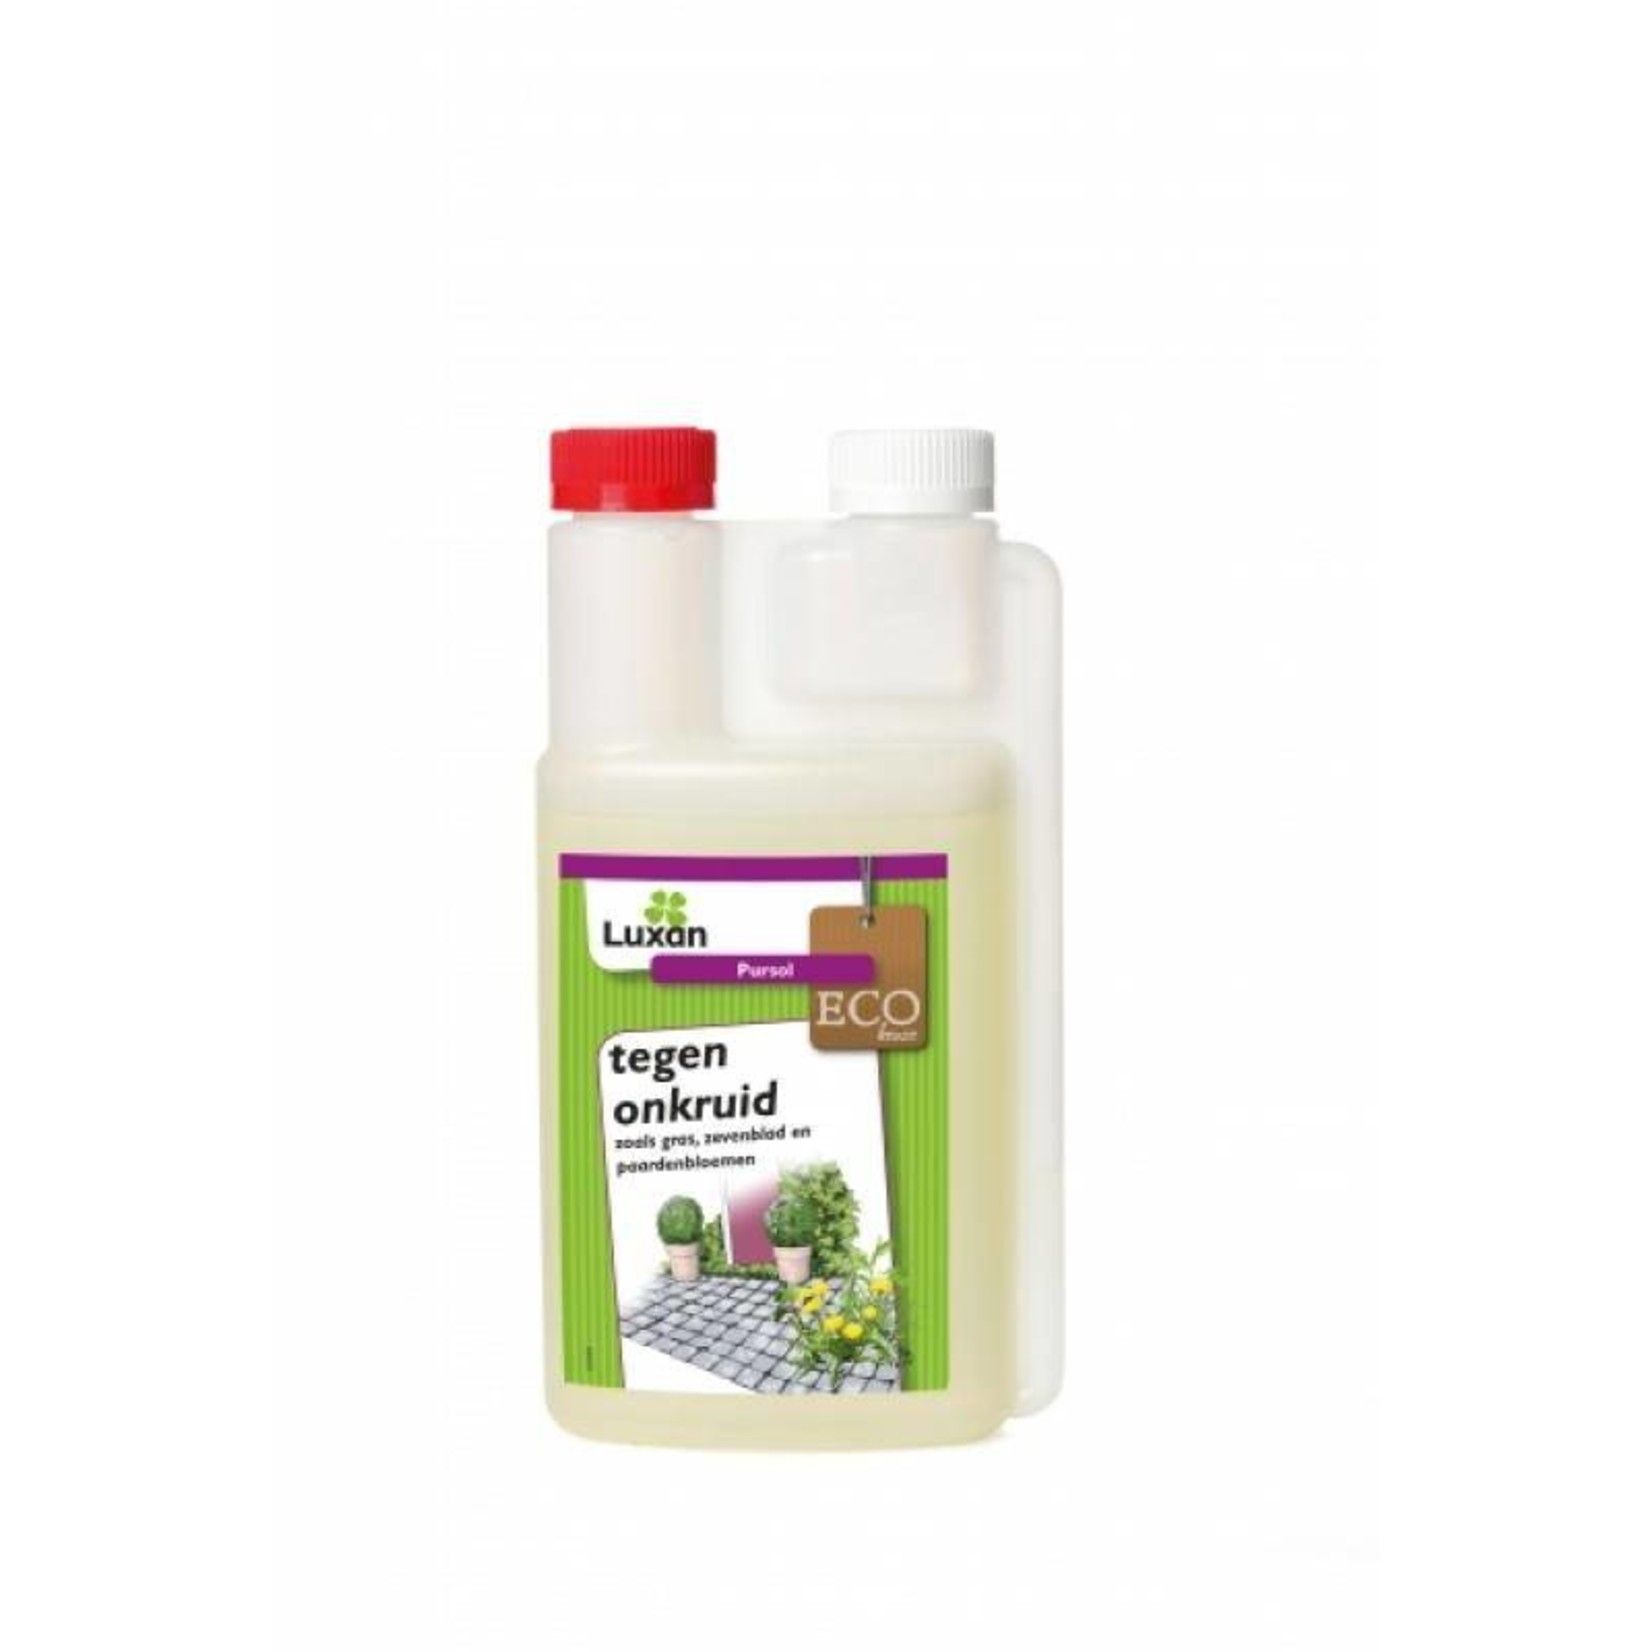 Luxan Pursol tegen onkruid op tegels 500 ml (concentraat)